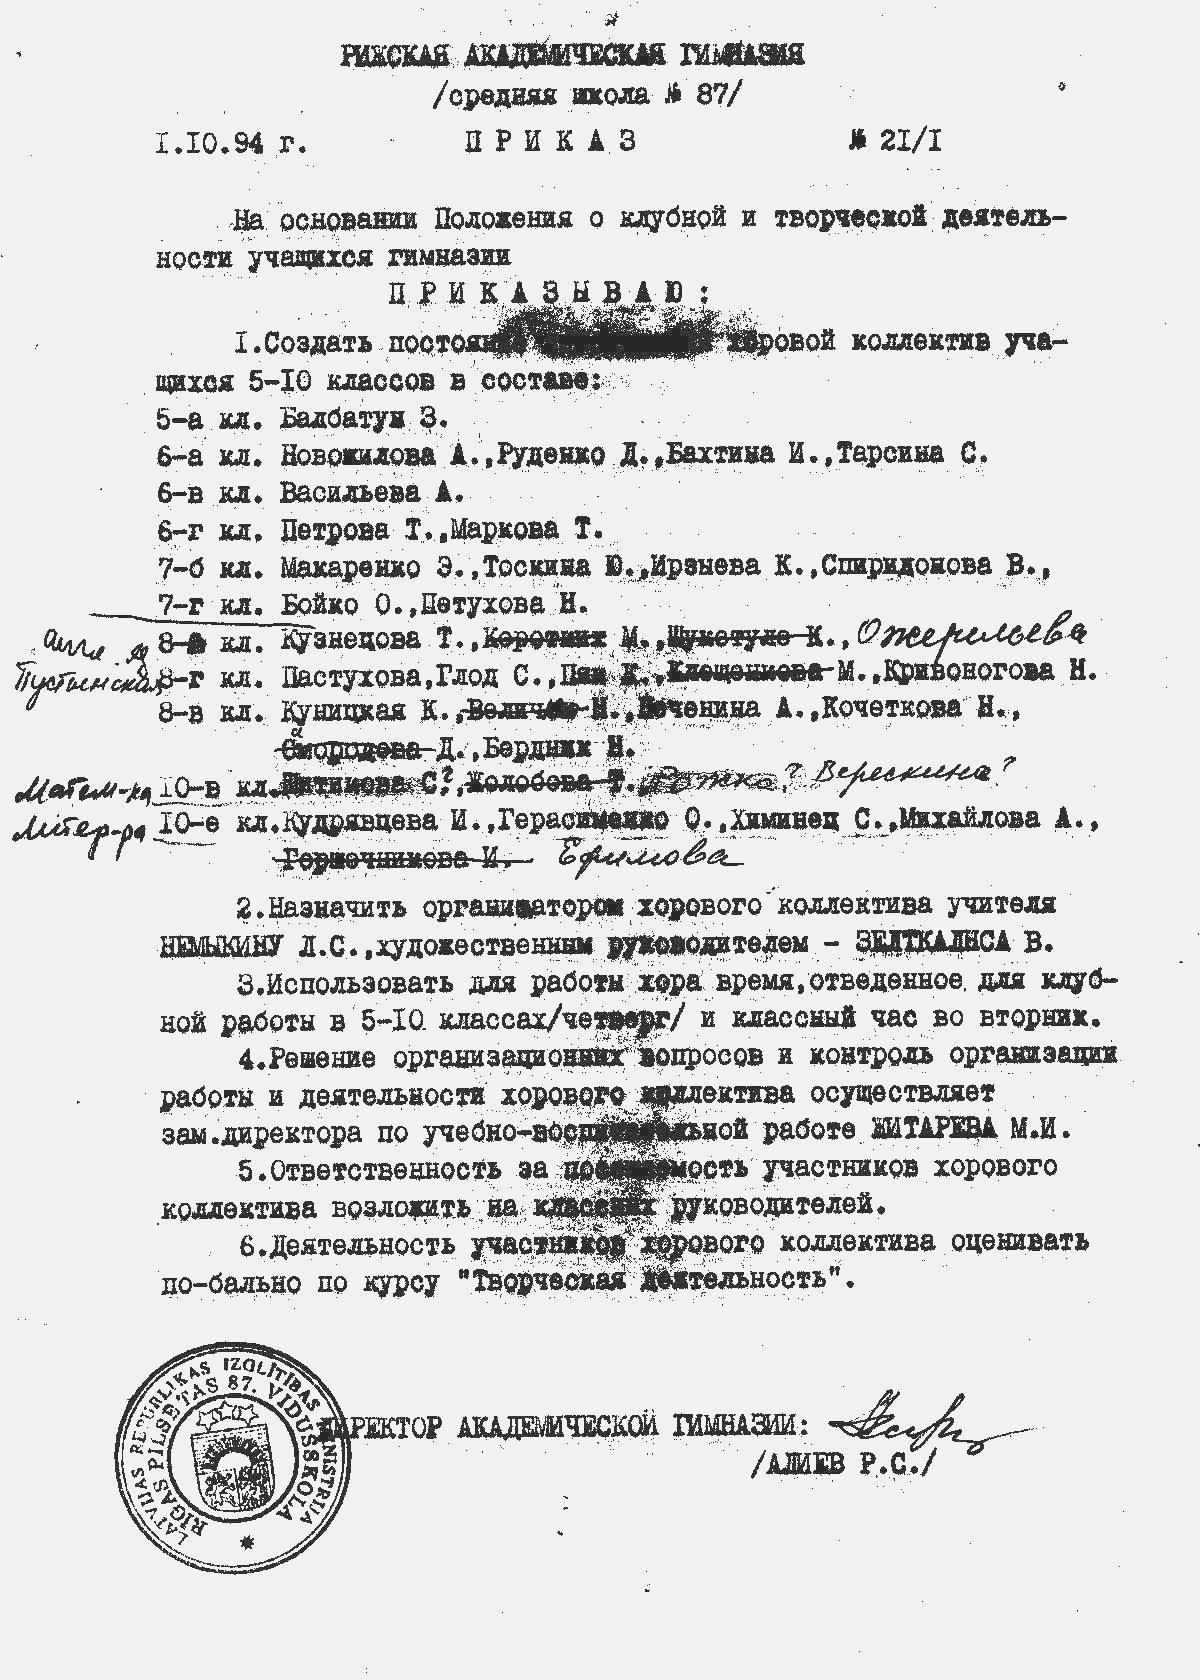 Koris Rikojums 1994